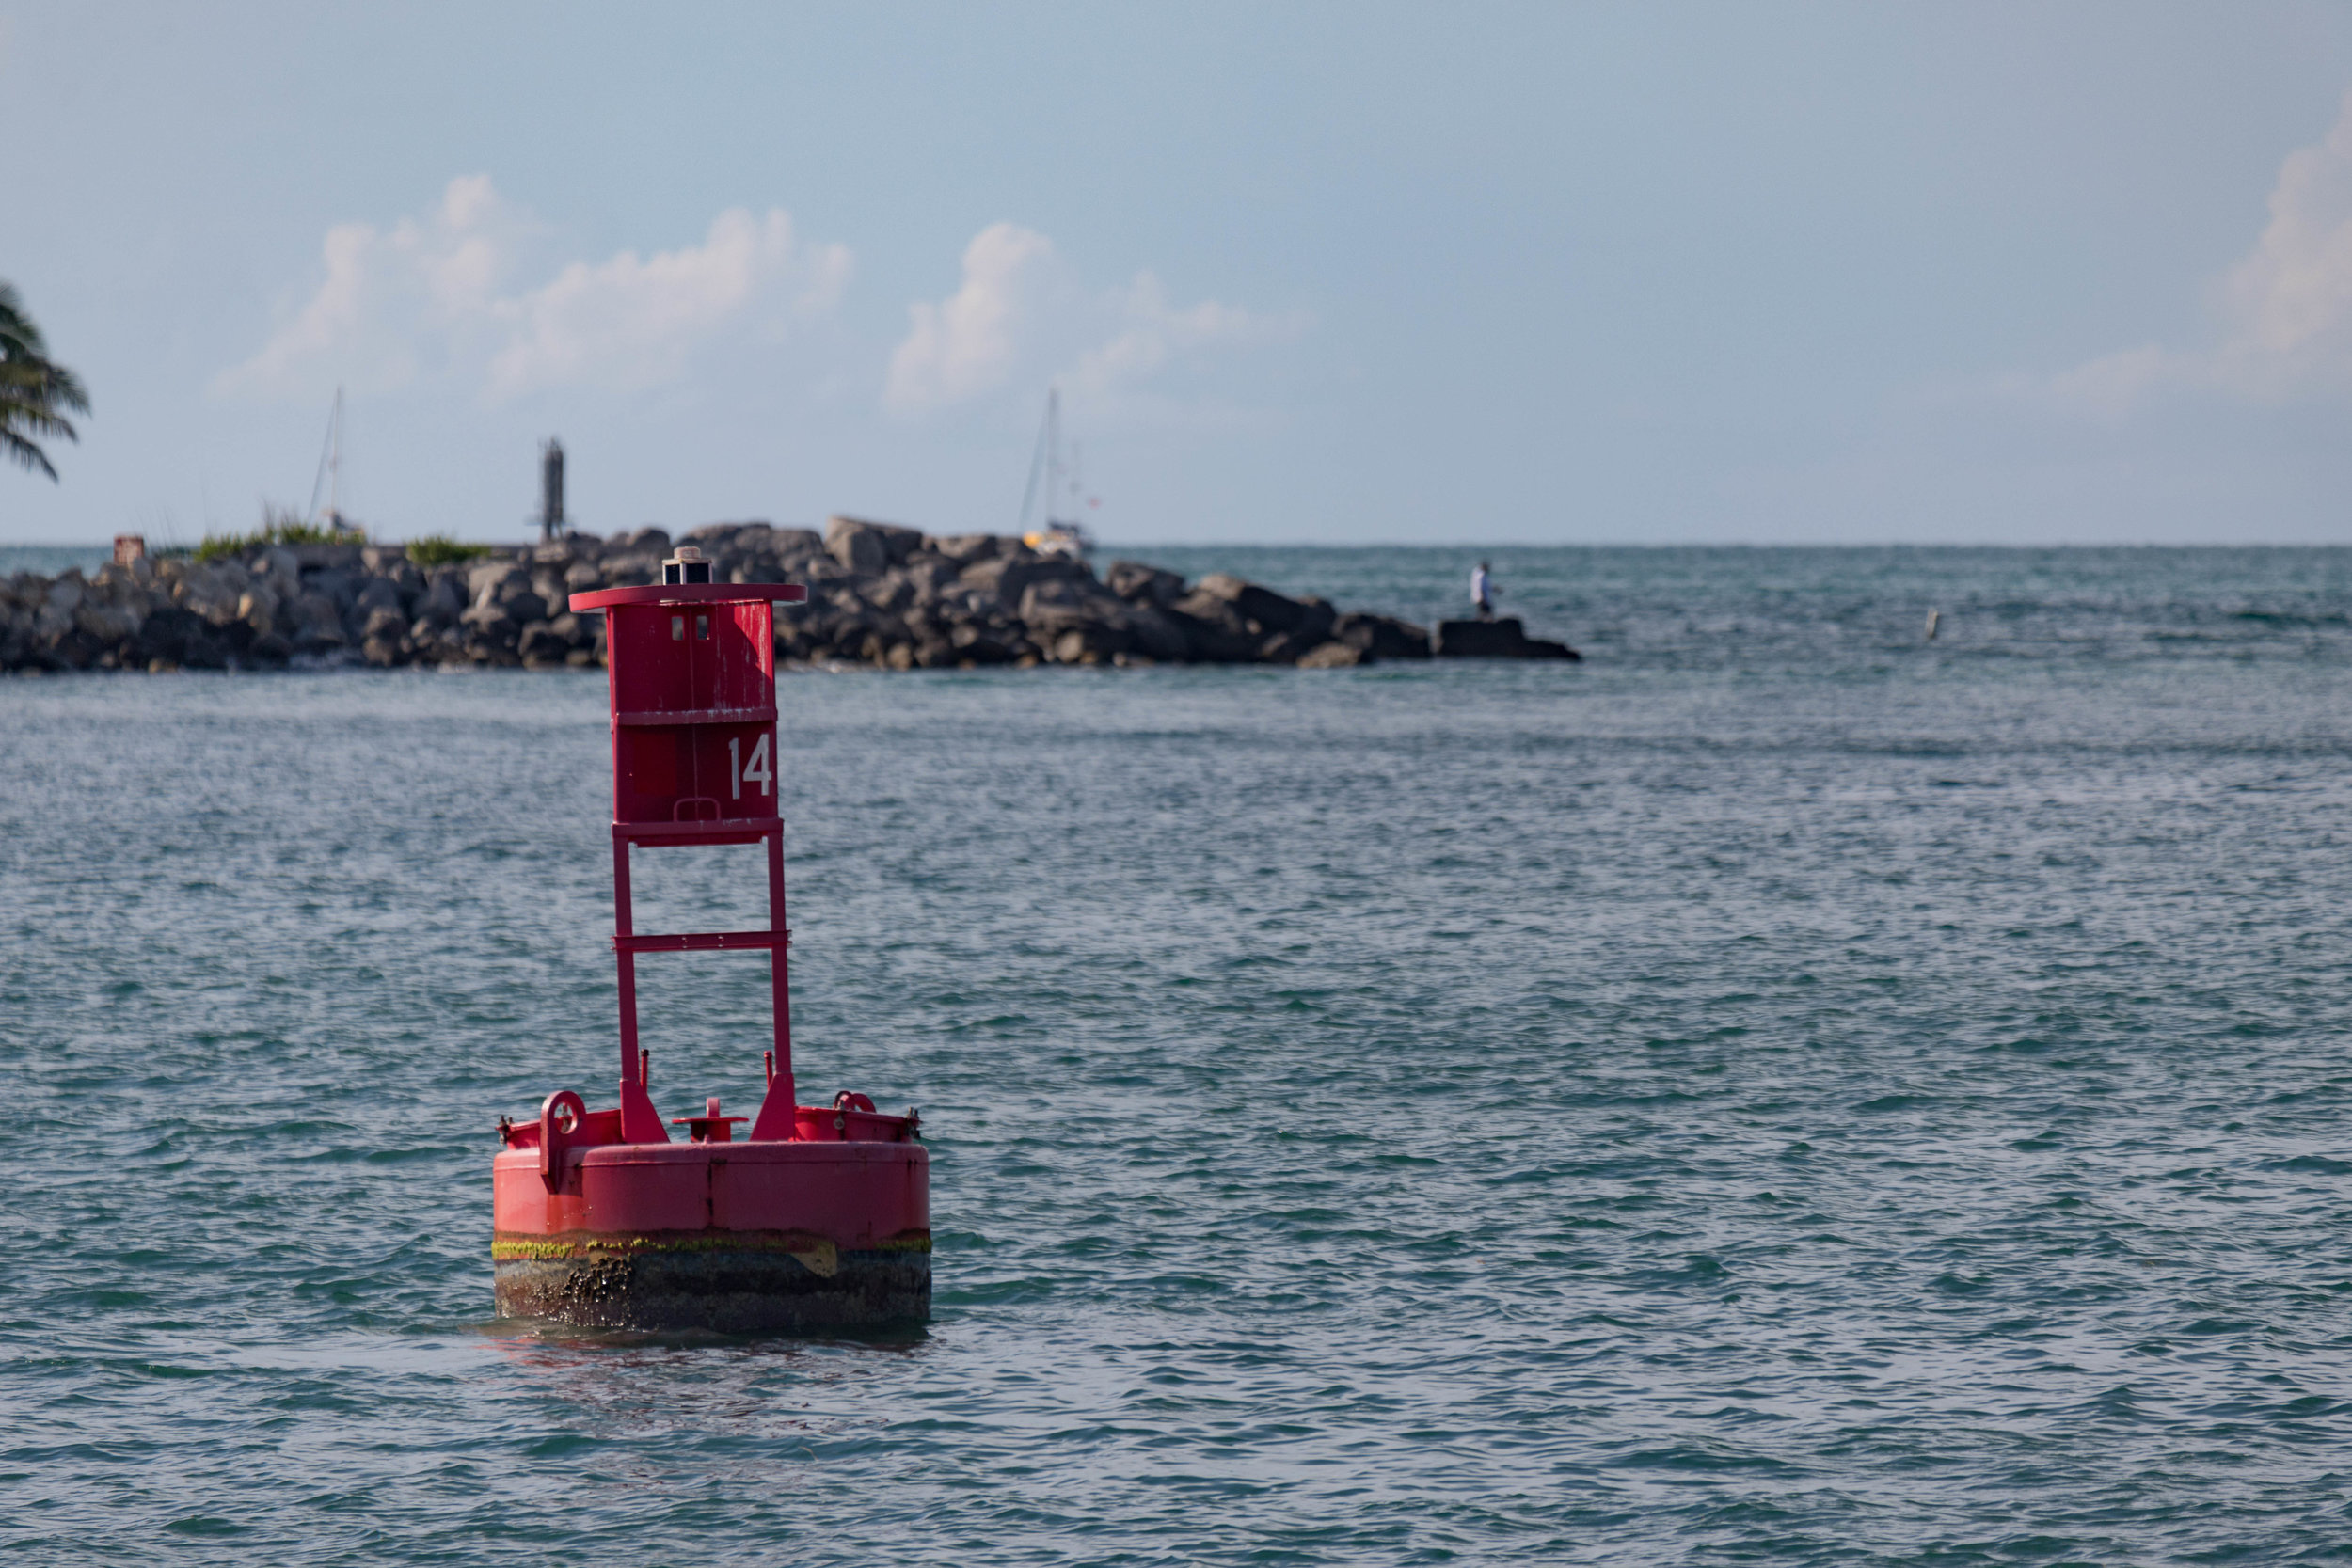 july 13, 2018  atlantic ocean - key west, florida